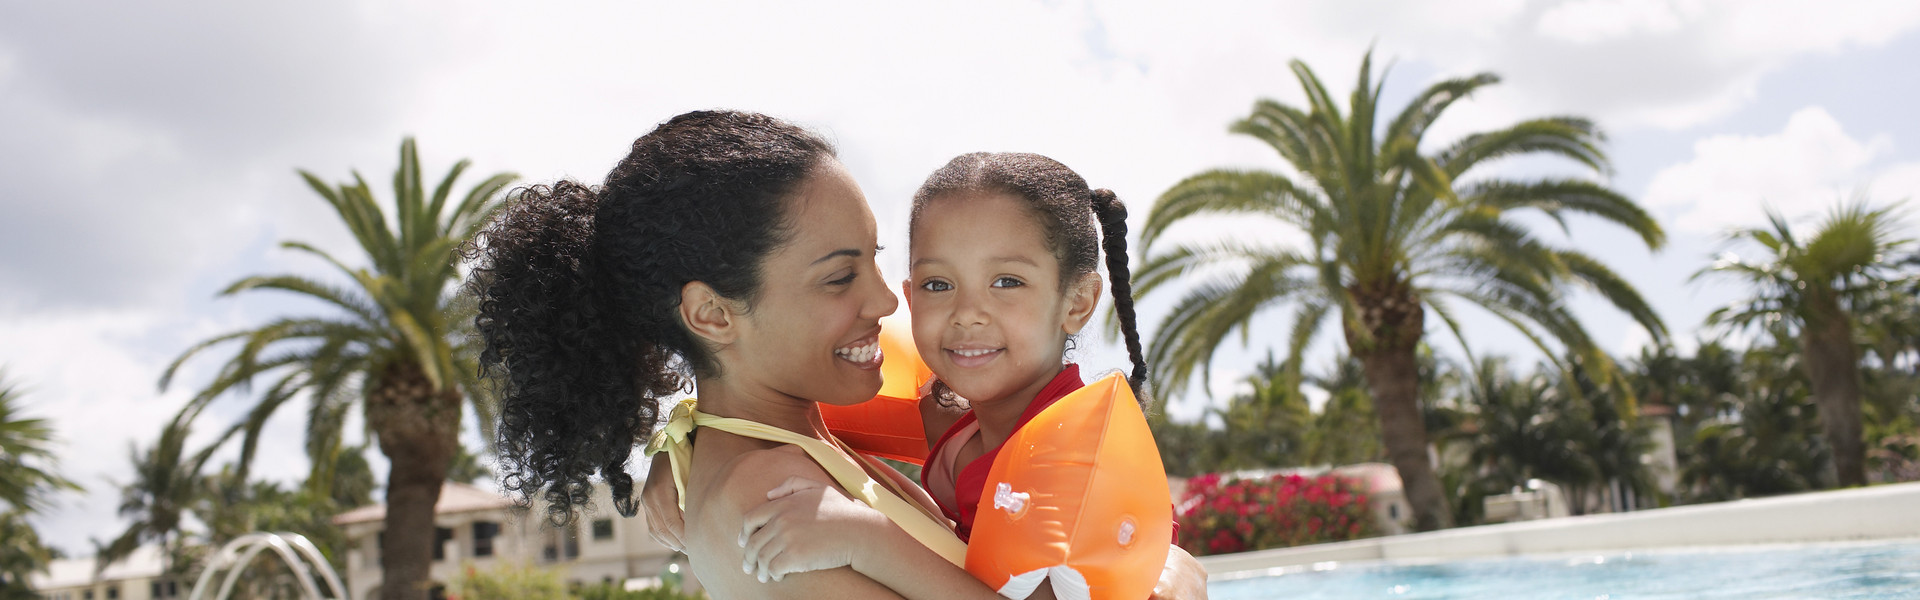 Lake Buena Vista Resort Florida Resident Discounts | Mother Daughter Vacation